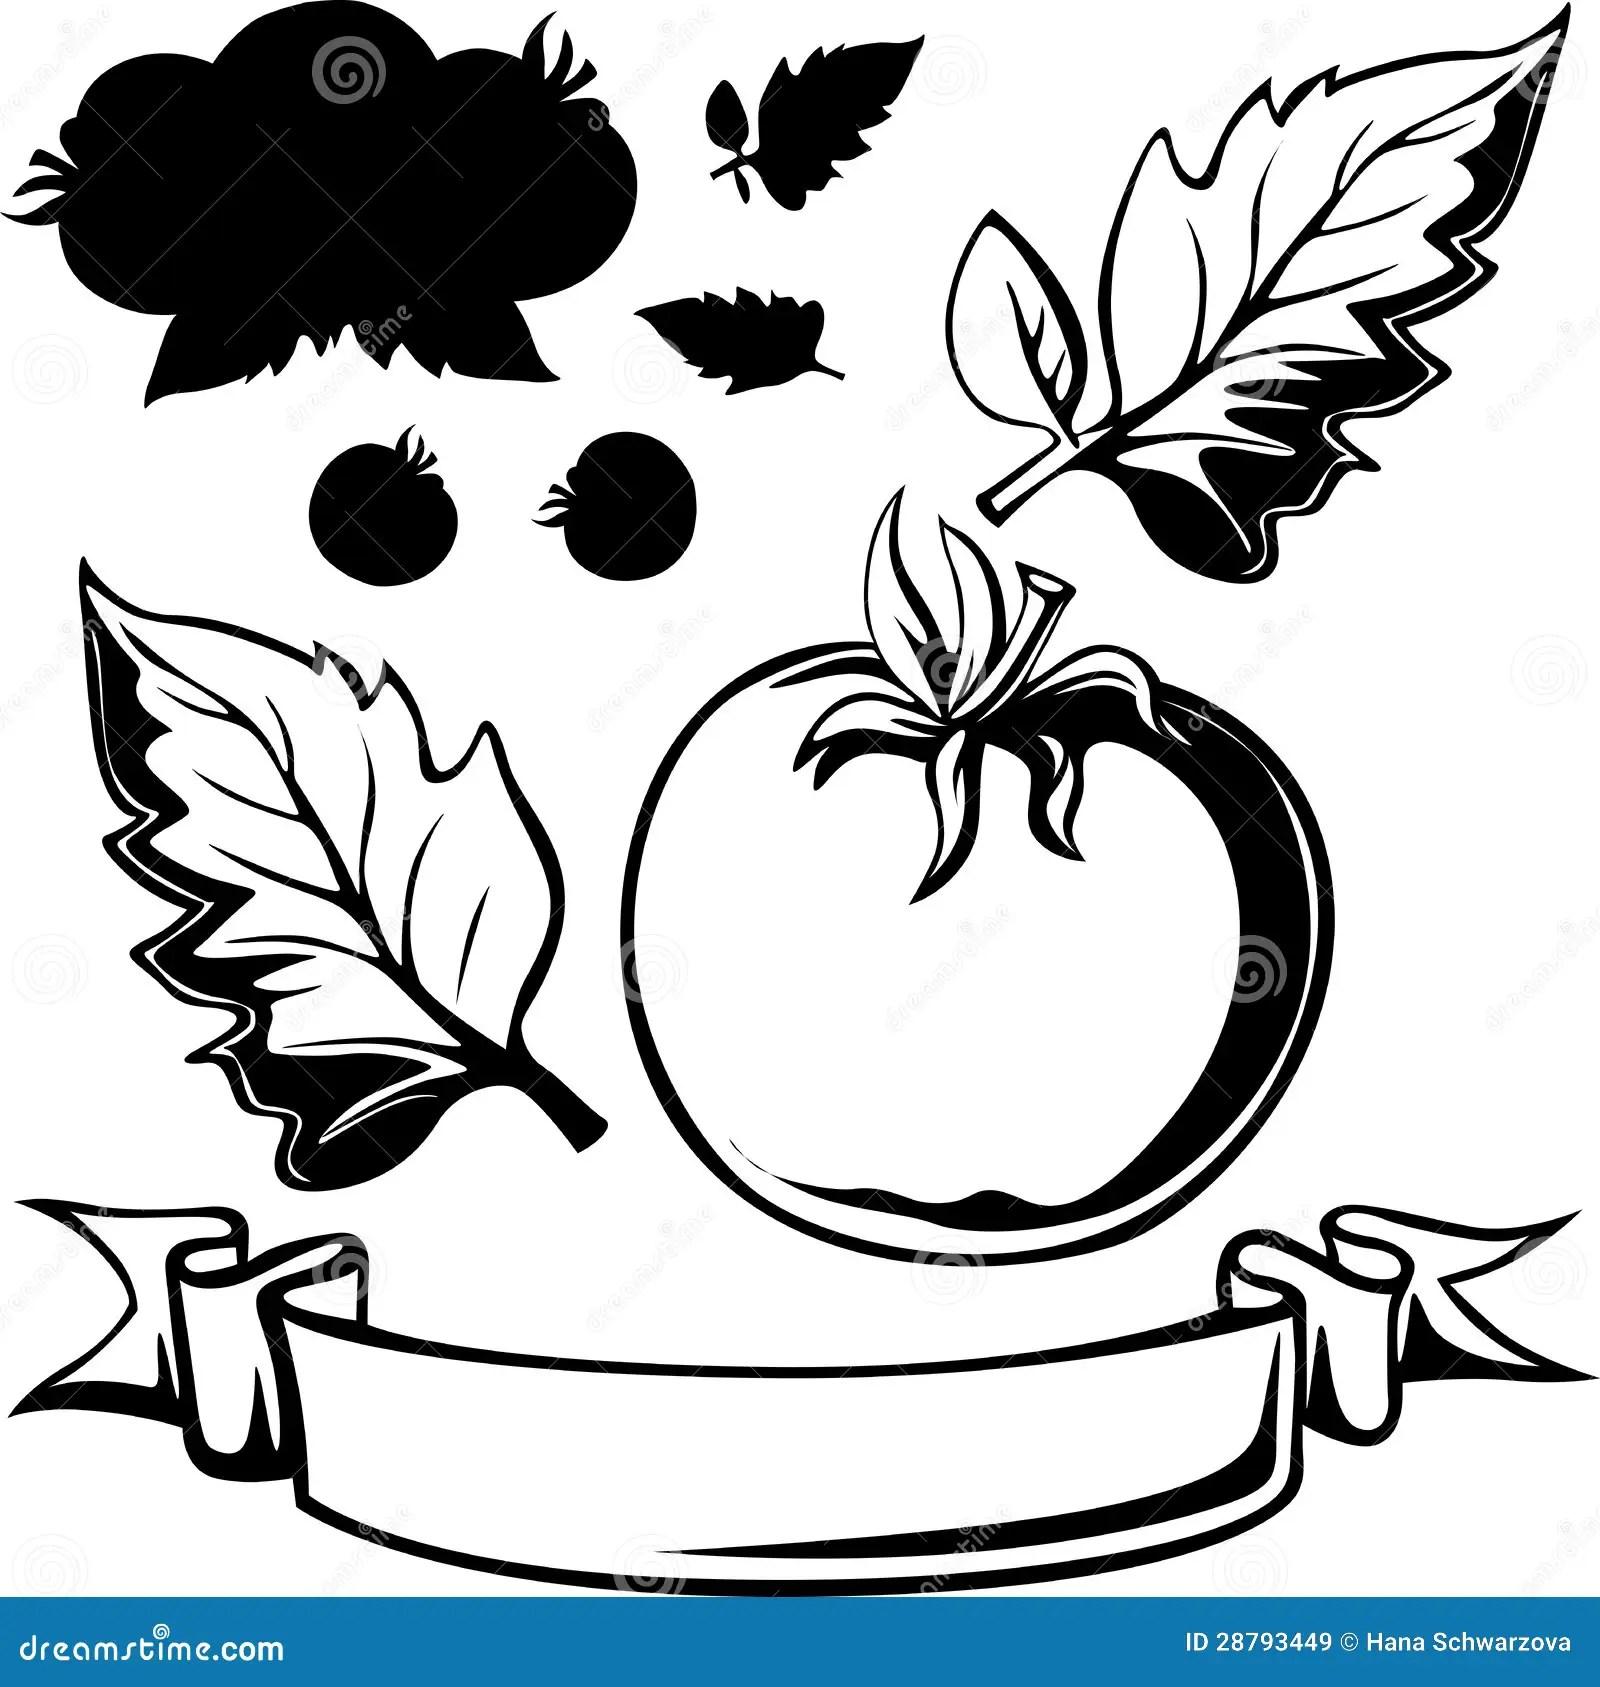 Tomato Black Line Illustration Royalty Free Stock Images